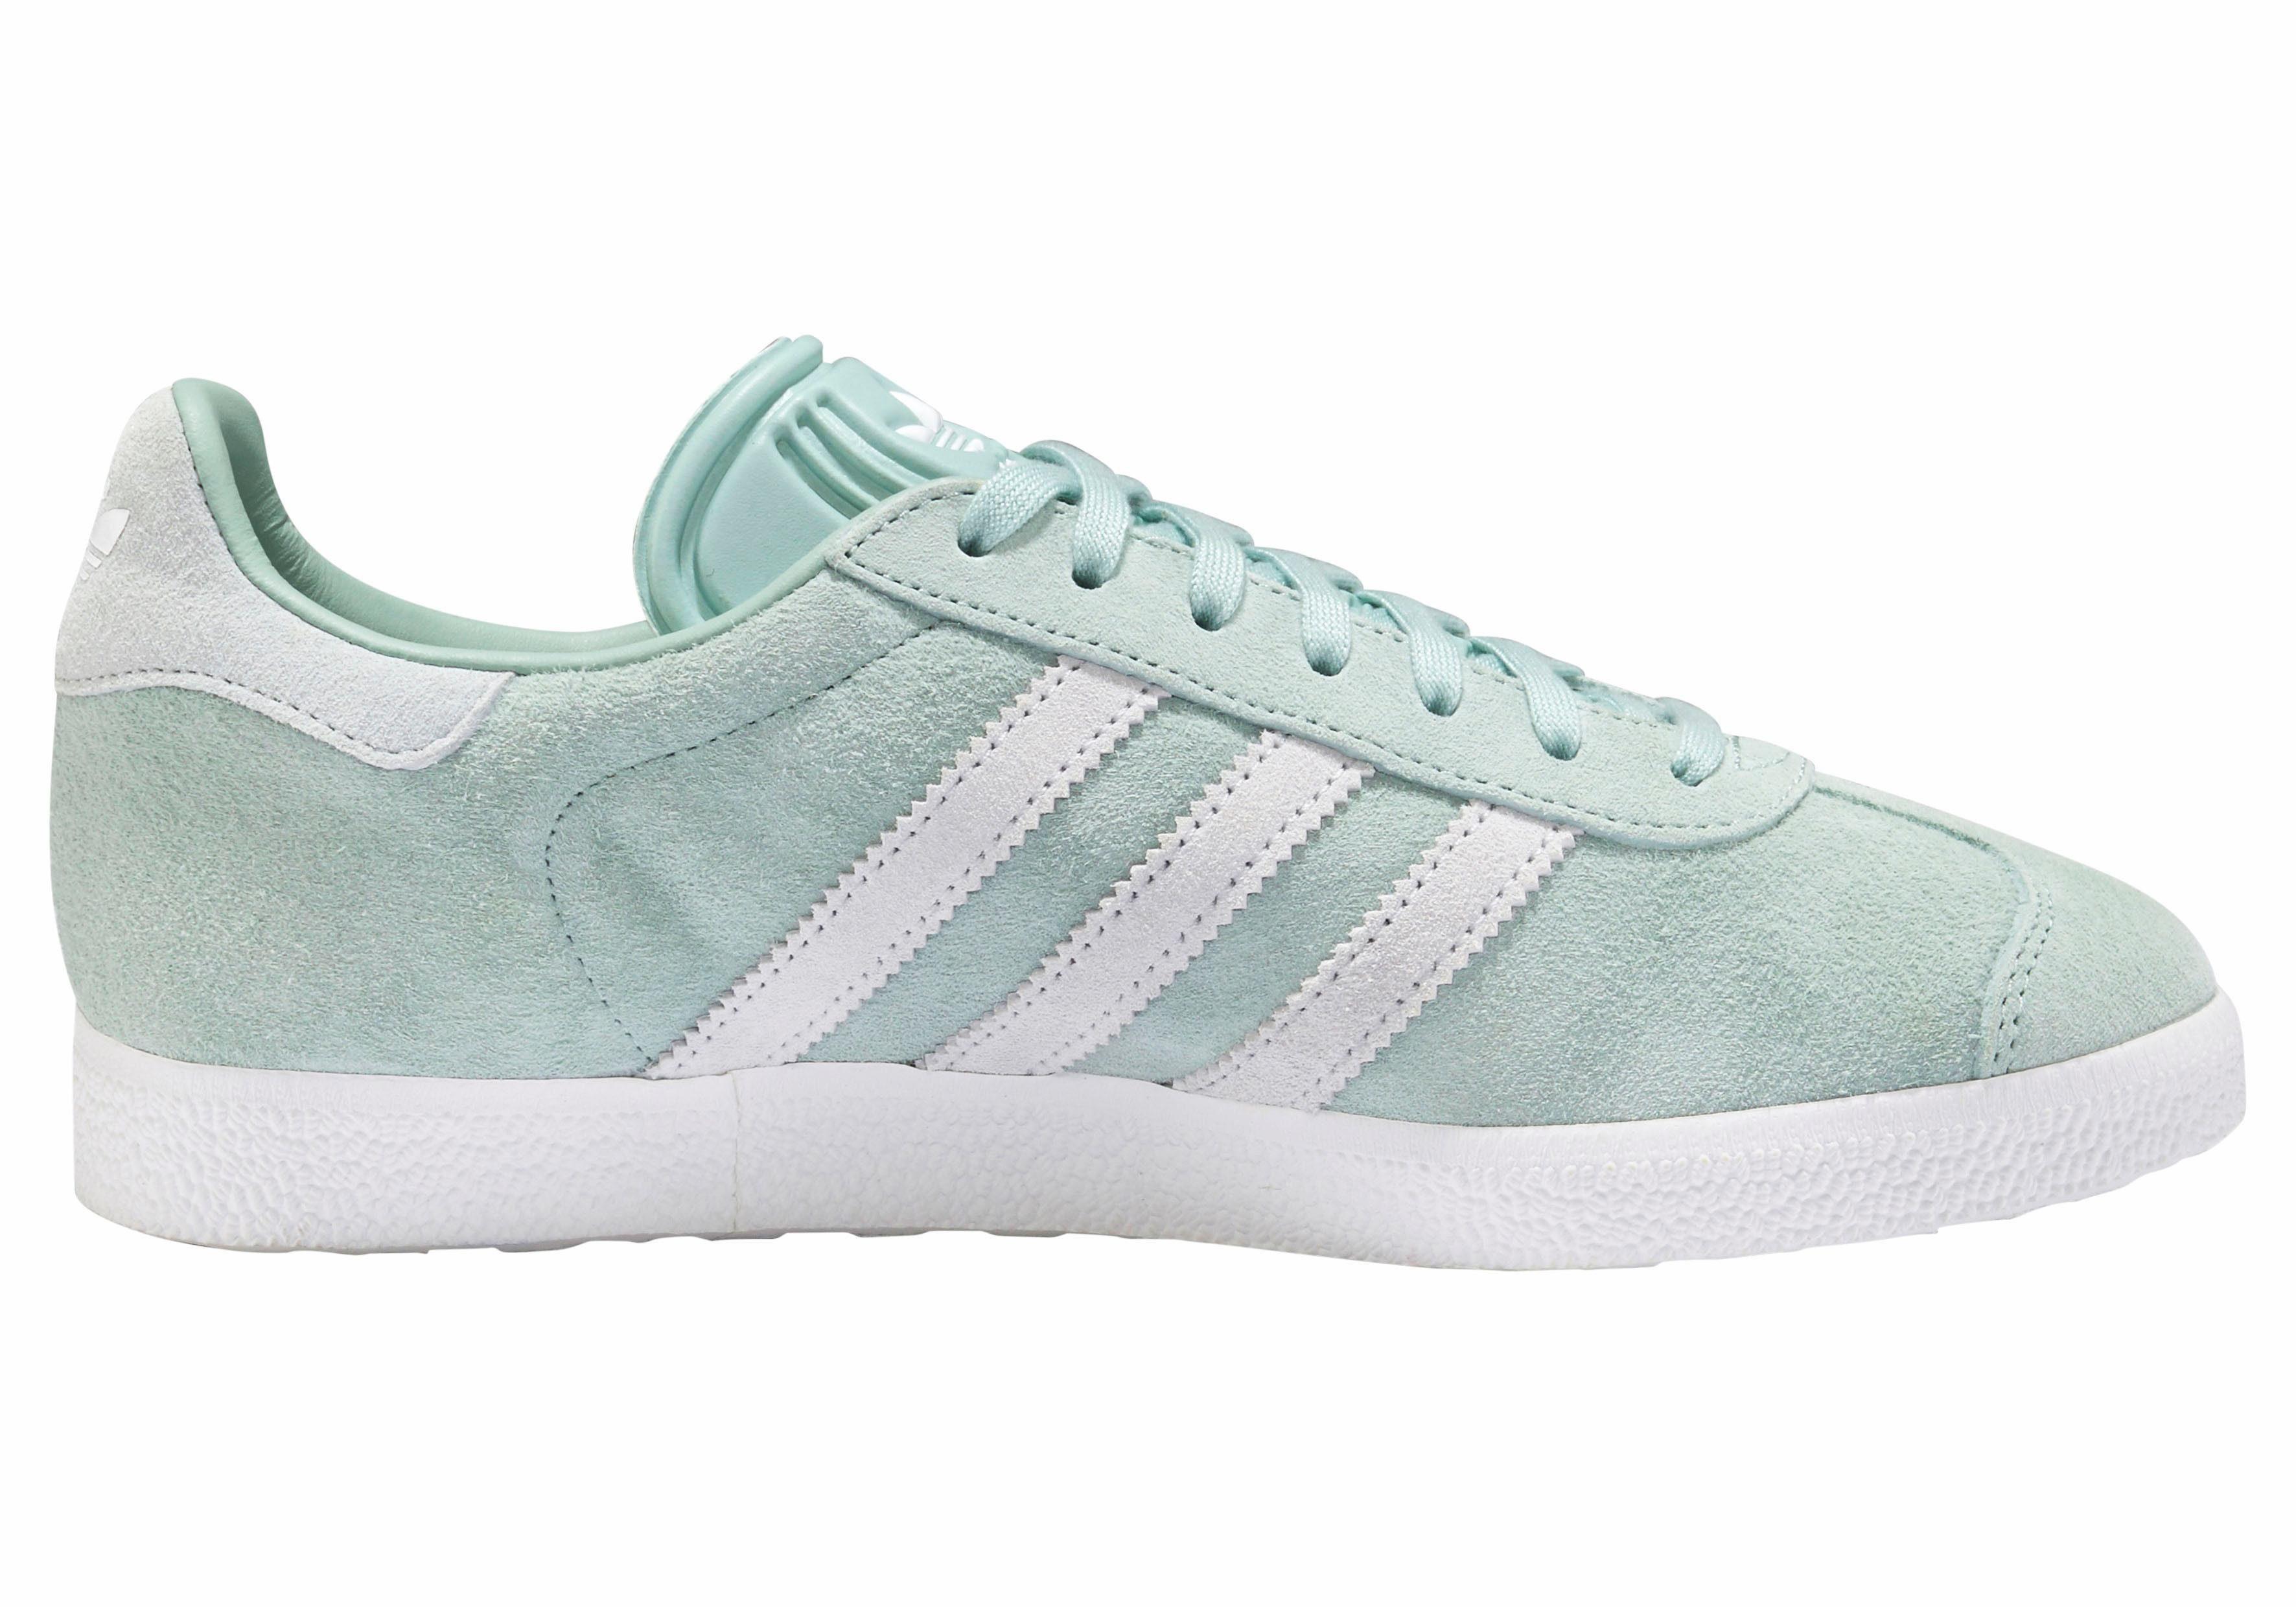 Originaux Adidas Sneakers Couche Gazelle W « Vert Pastel 3gjDC4eh